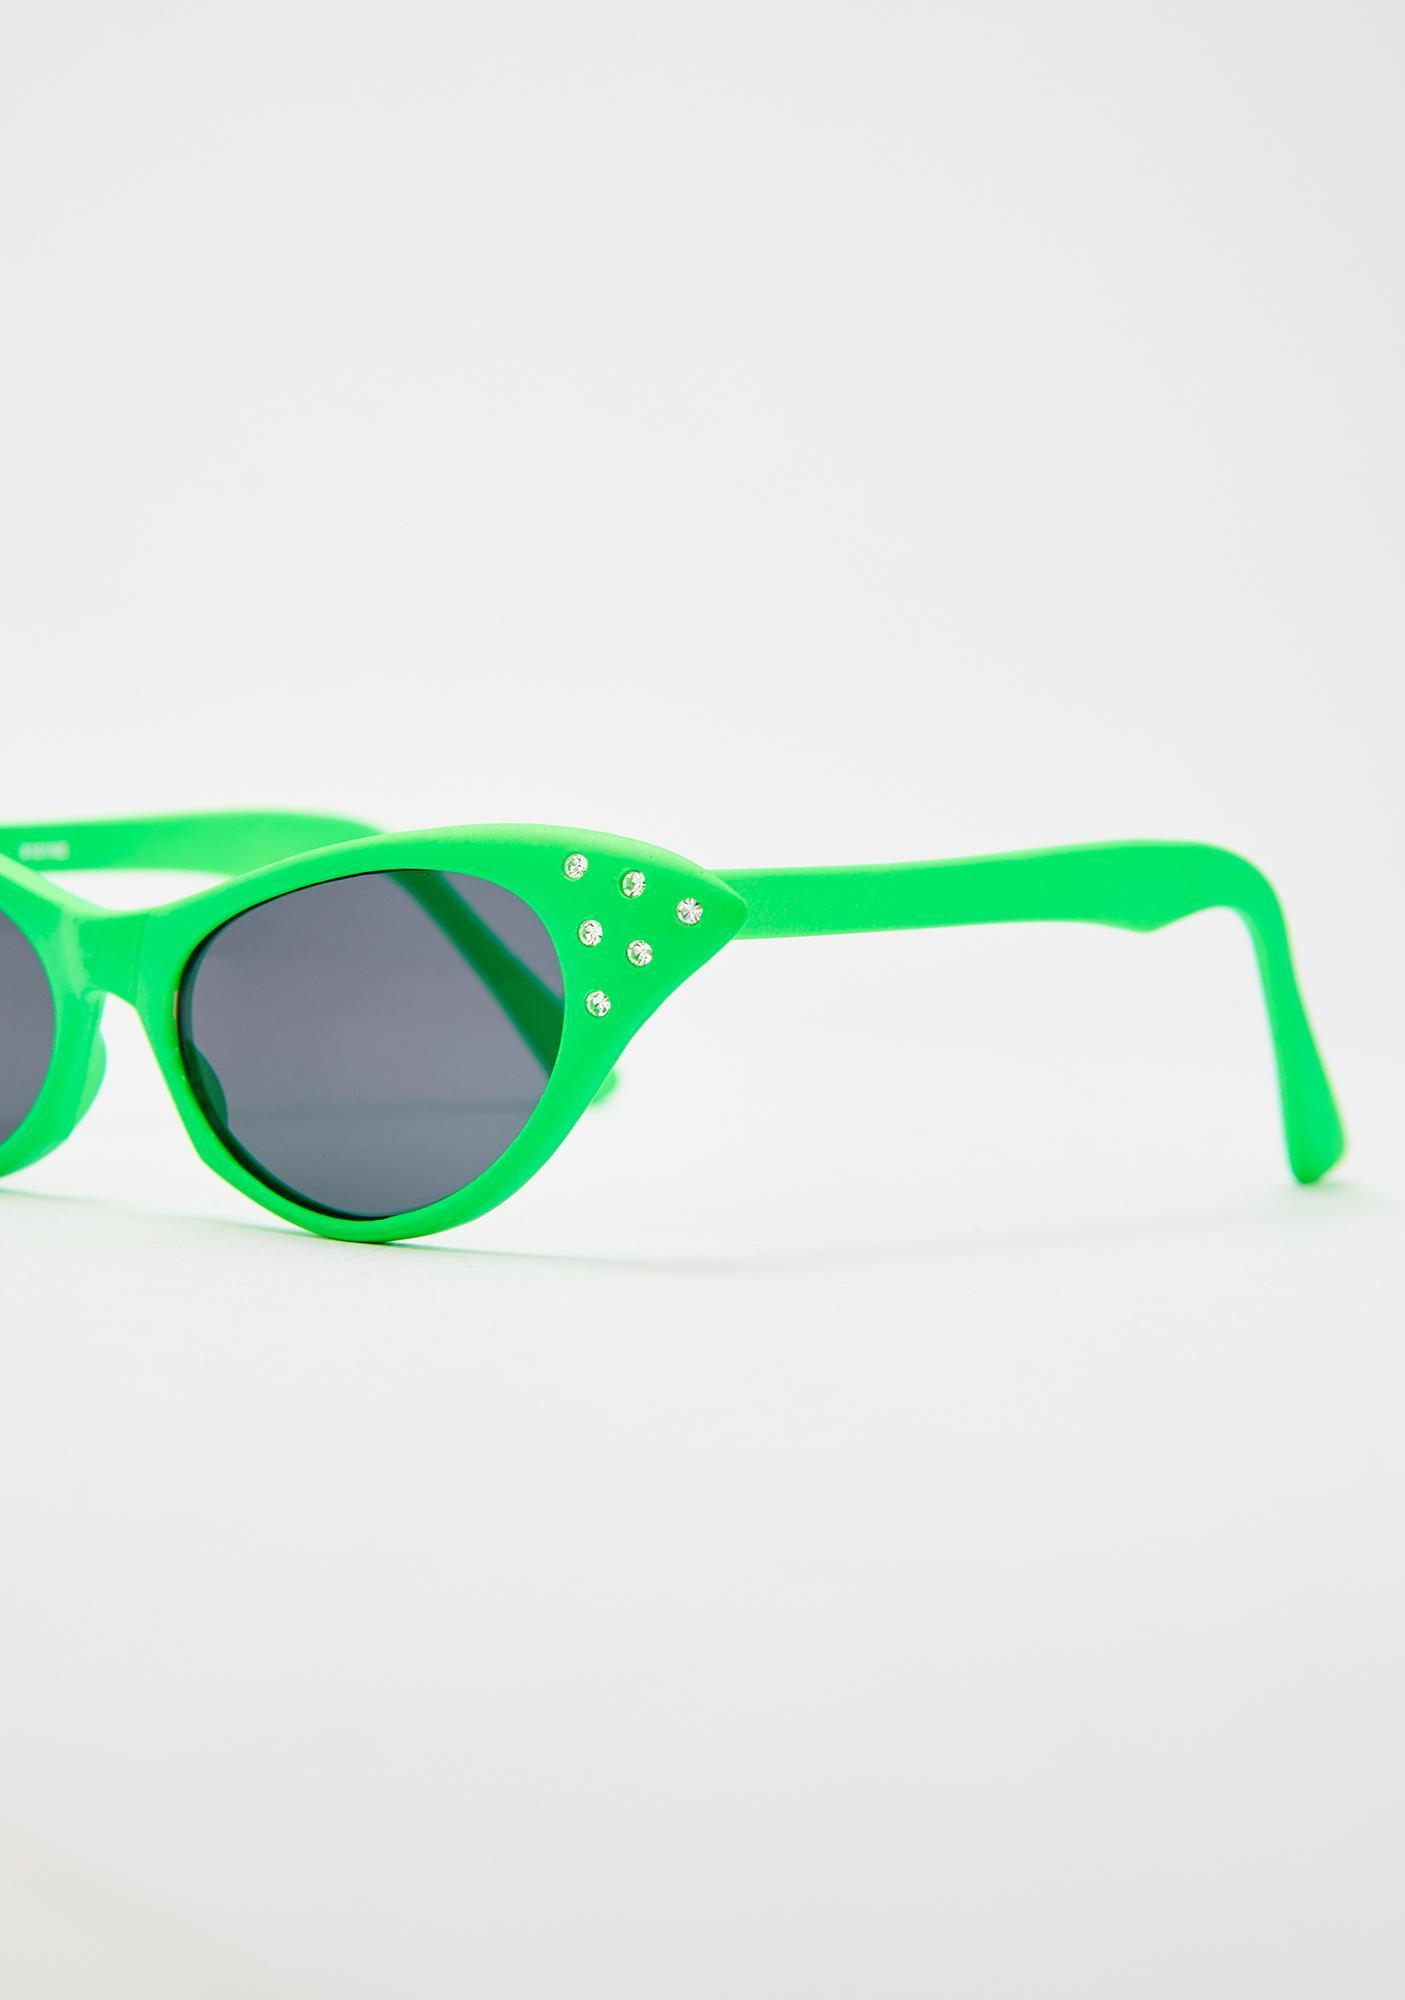 Giant Vintage Dank BLAM! Cat Eye Sunglasses